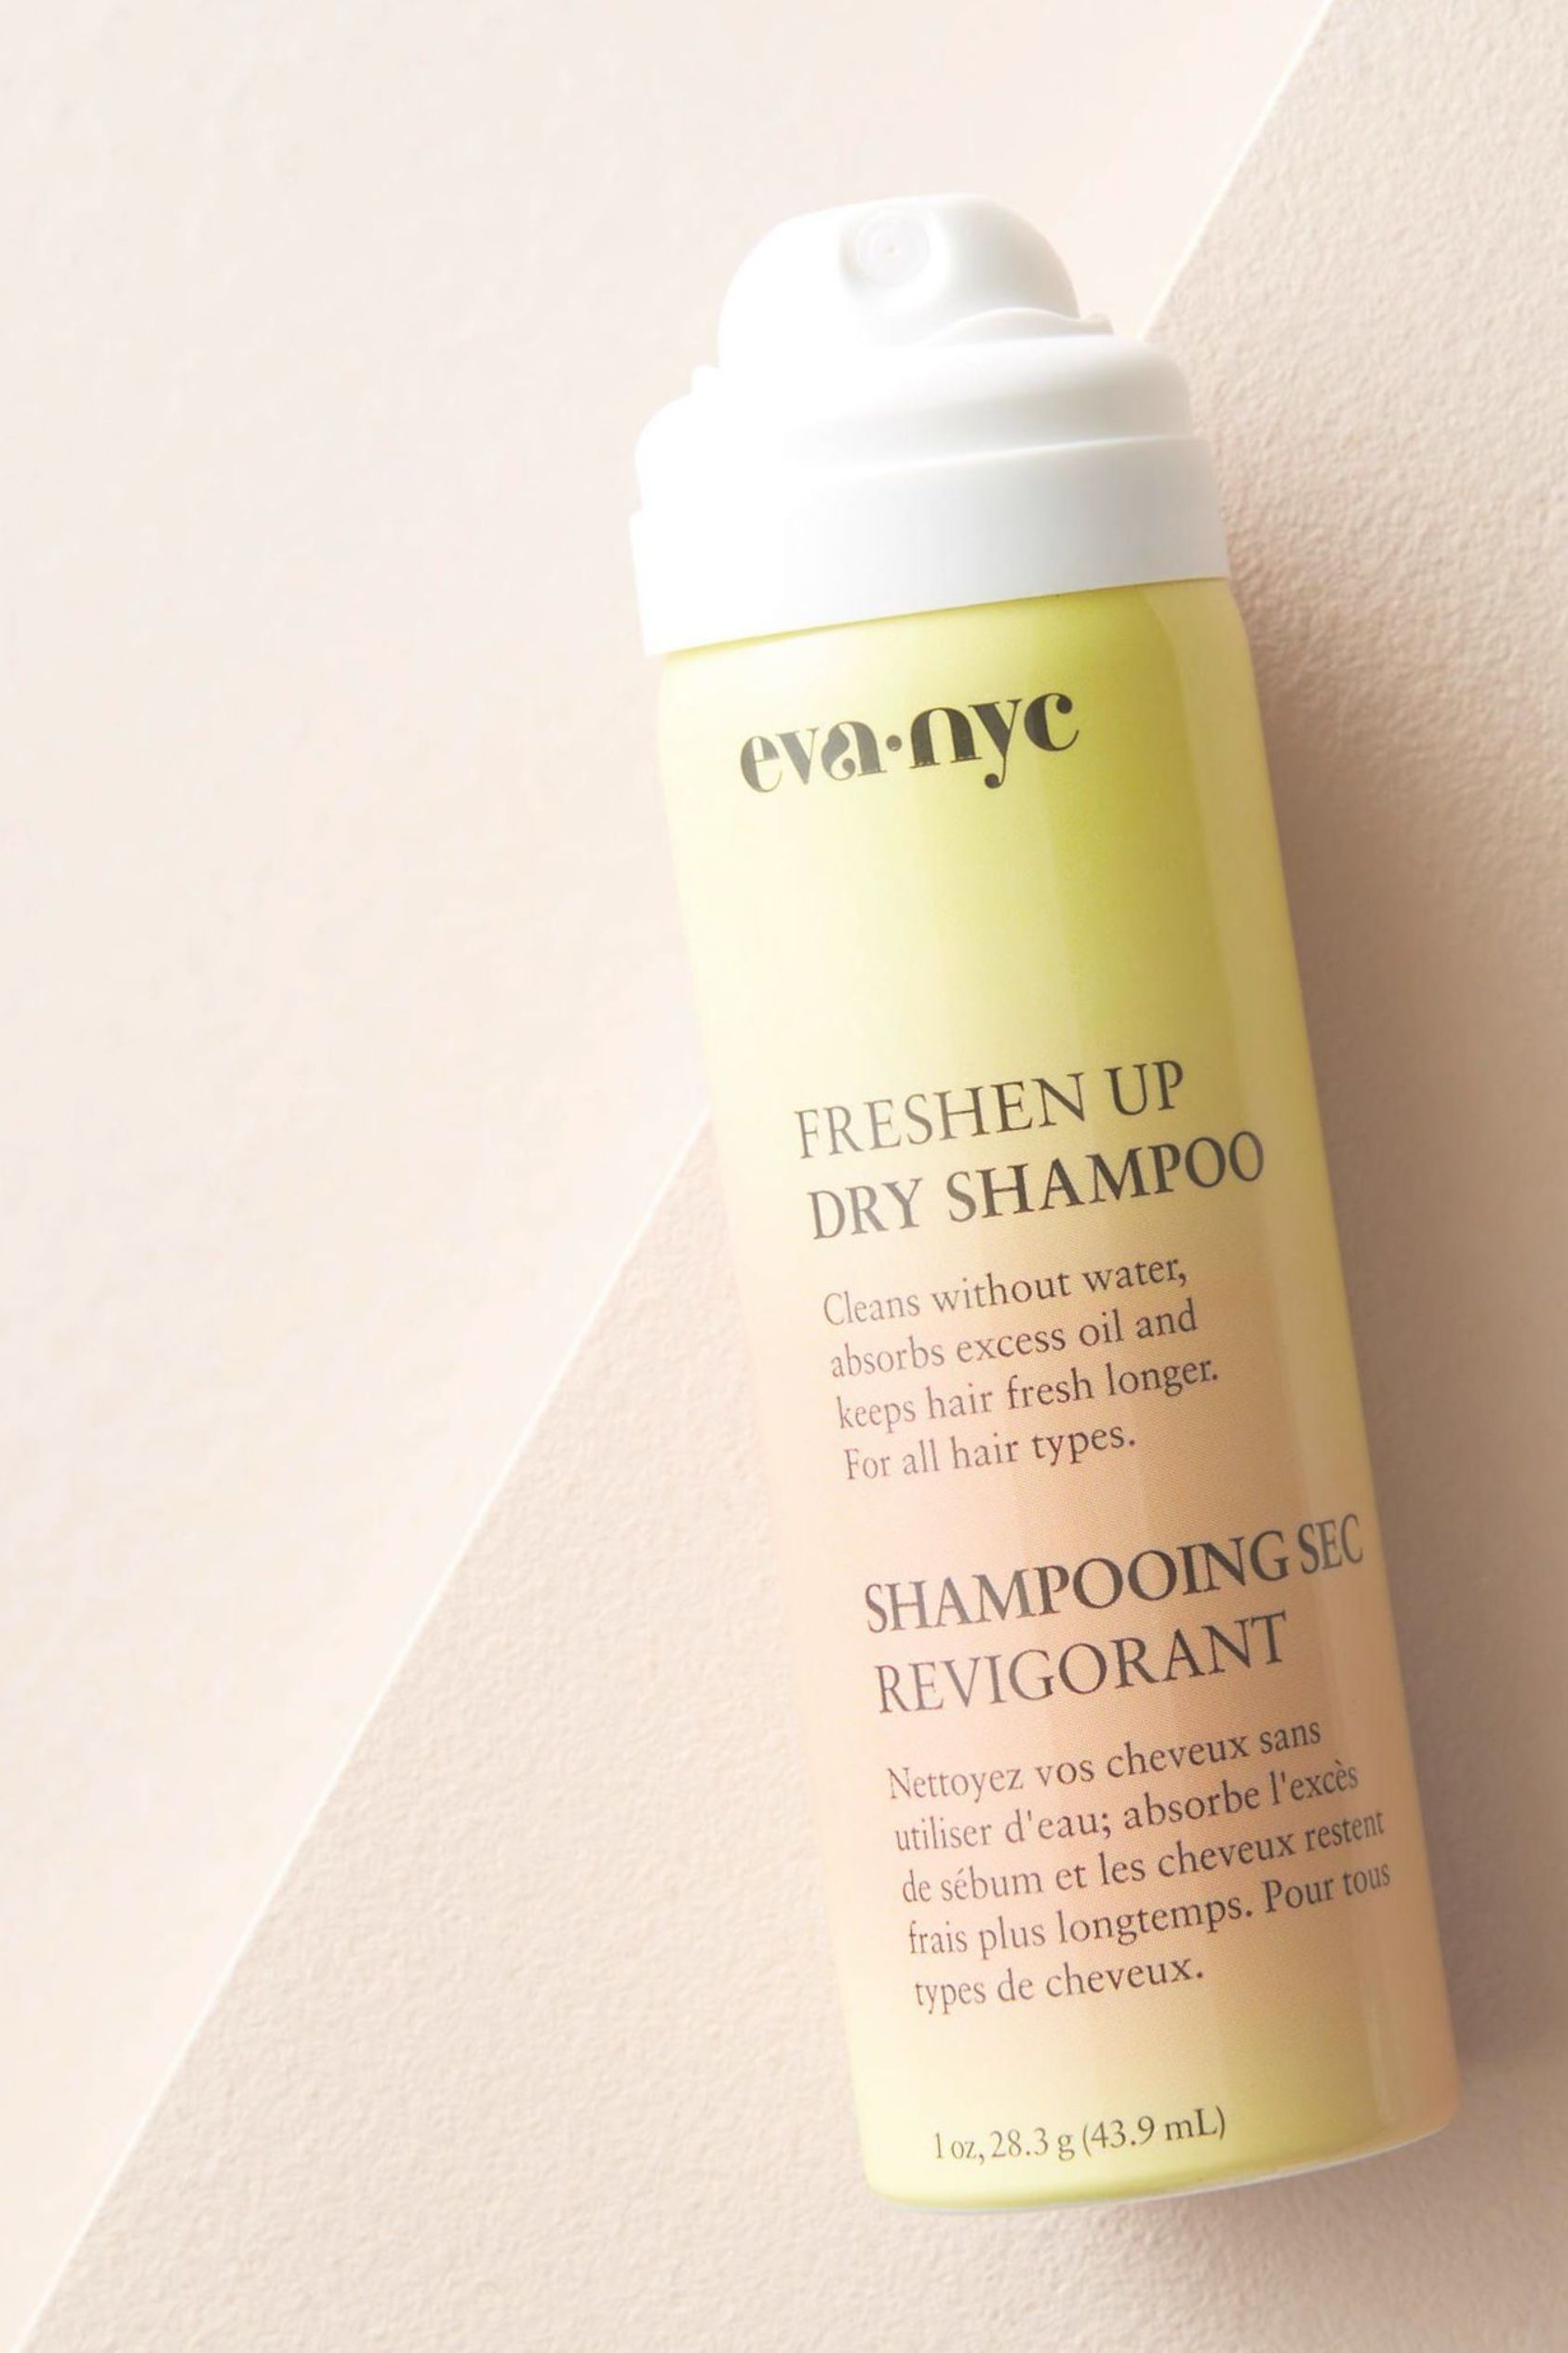 Eva Nyc Travel Freshen Up Dry Shampoo By In Yellow Size All Bath Body At Anthropologie Dry Shampoo Eva Nyc Shampoo